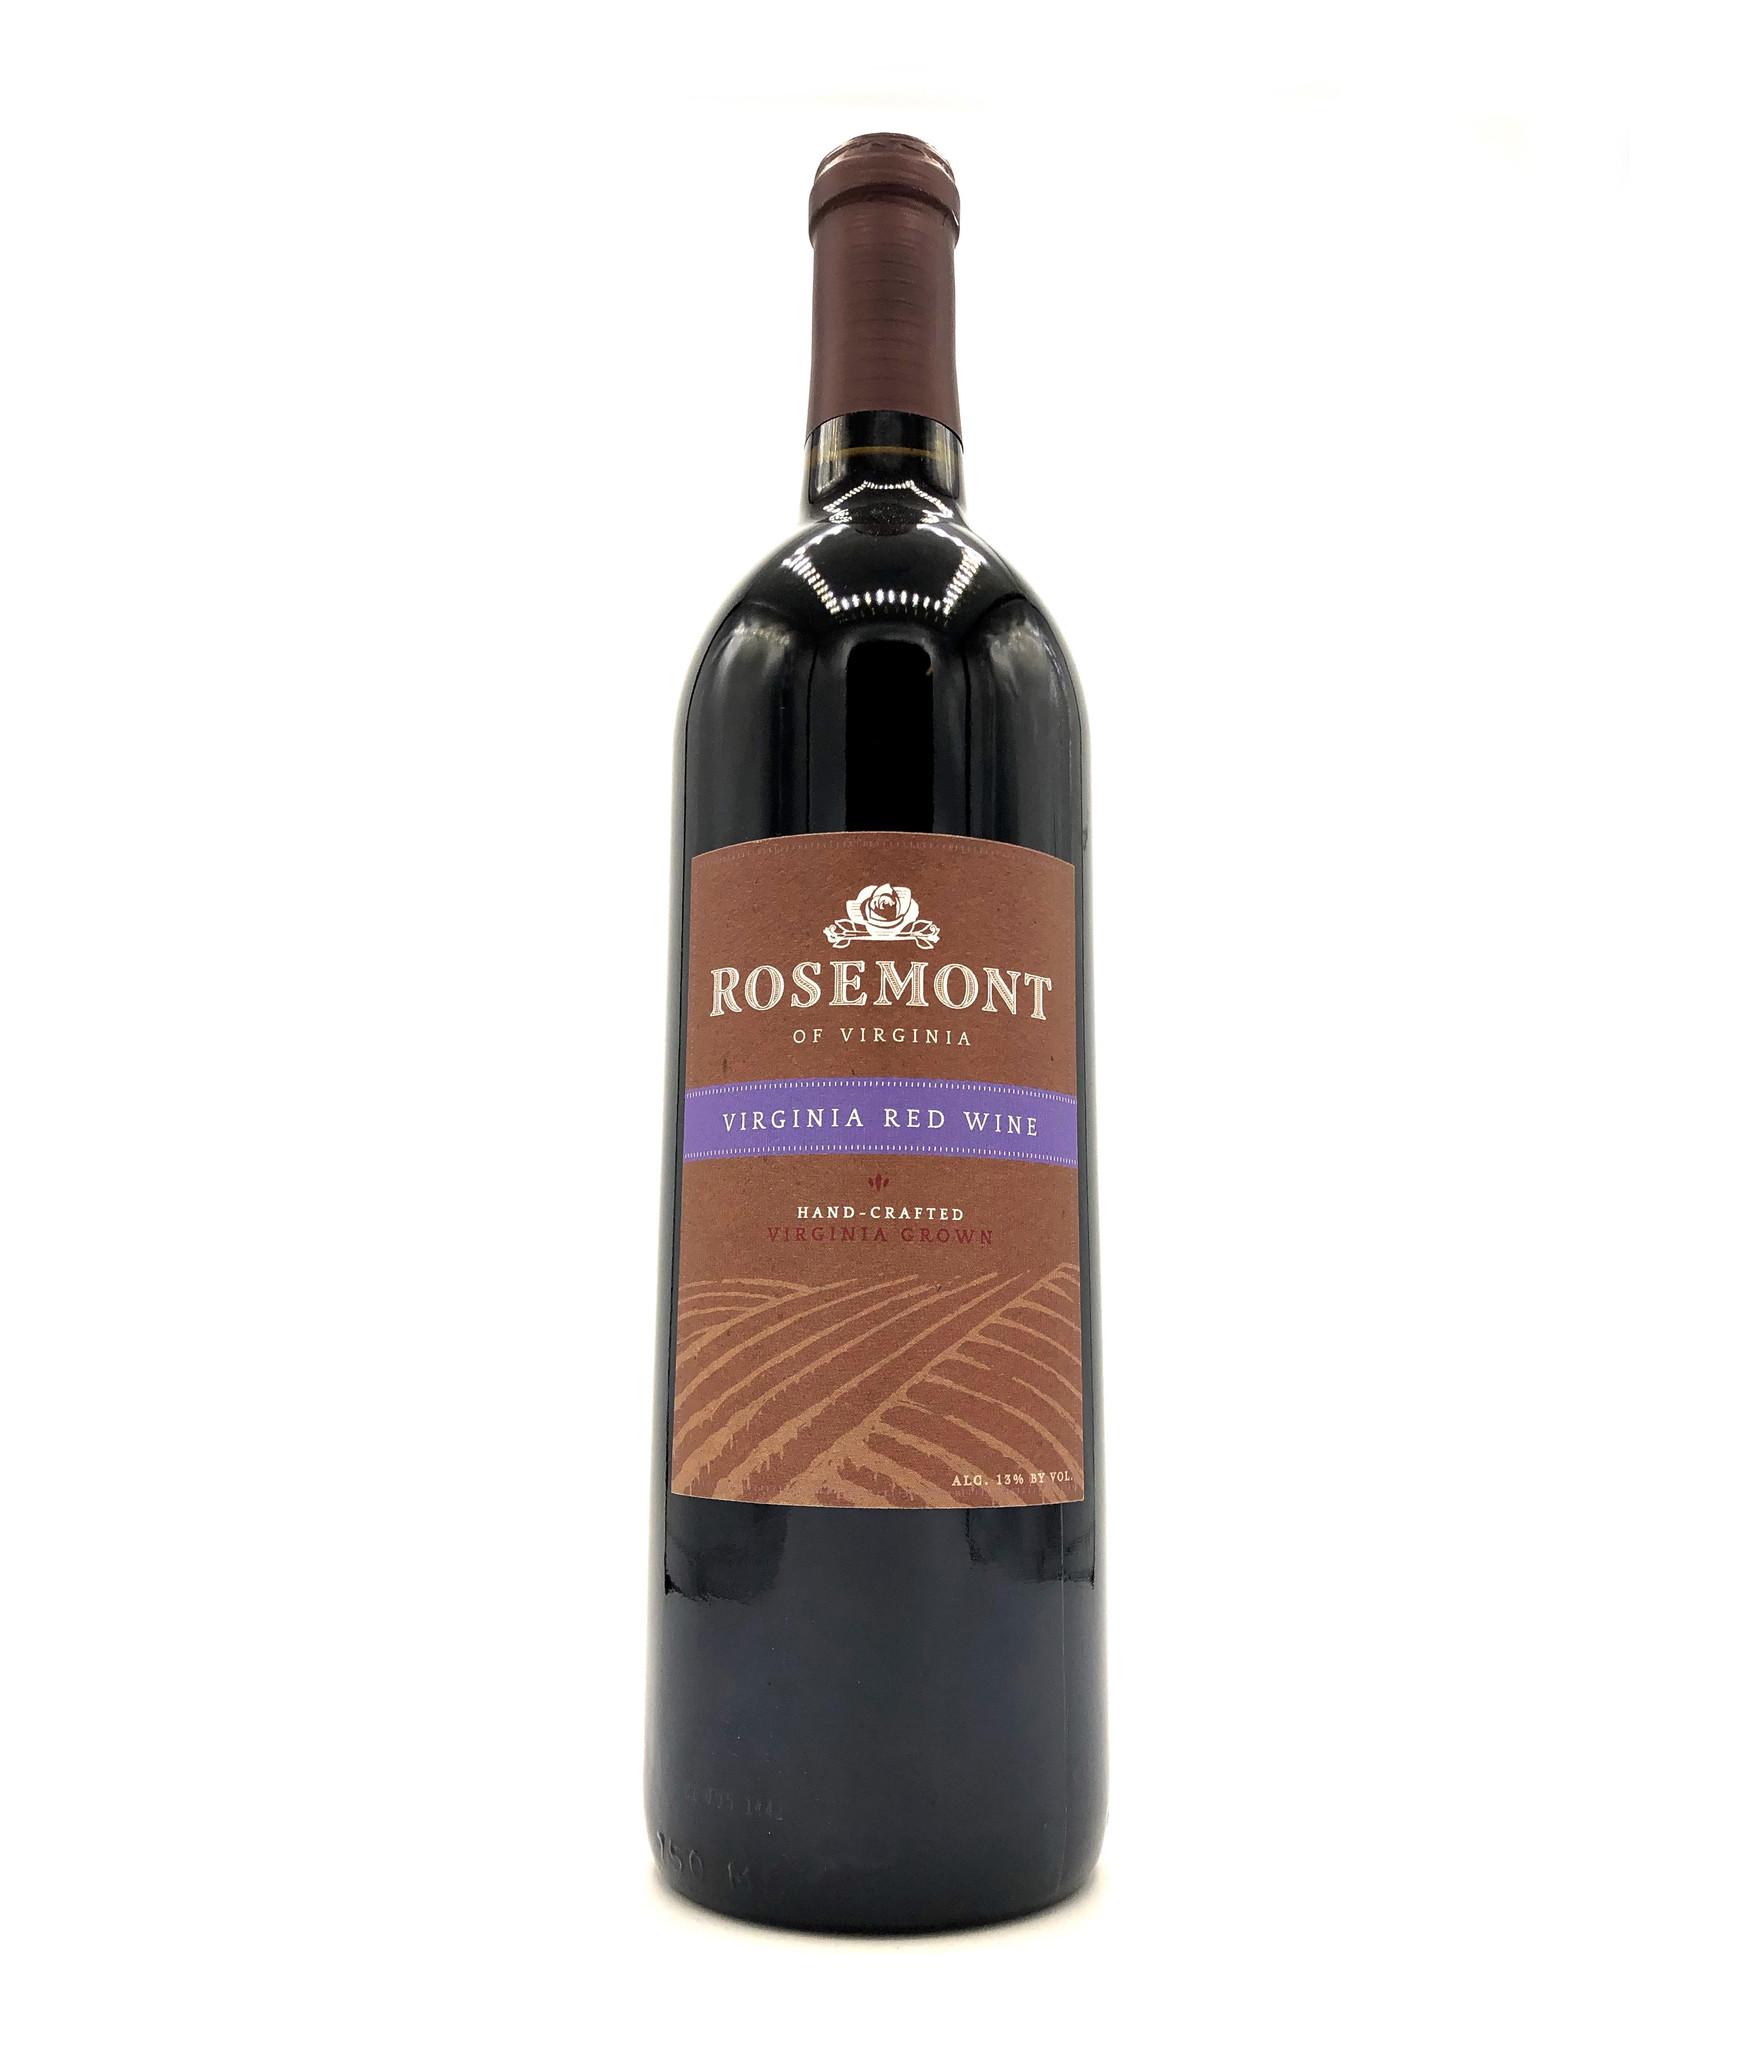 Bordeaux Blend NV Rosemont of Virginia